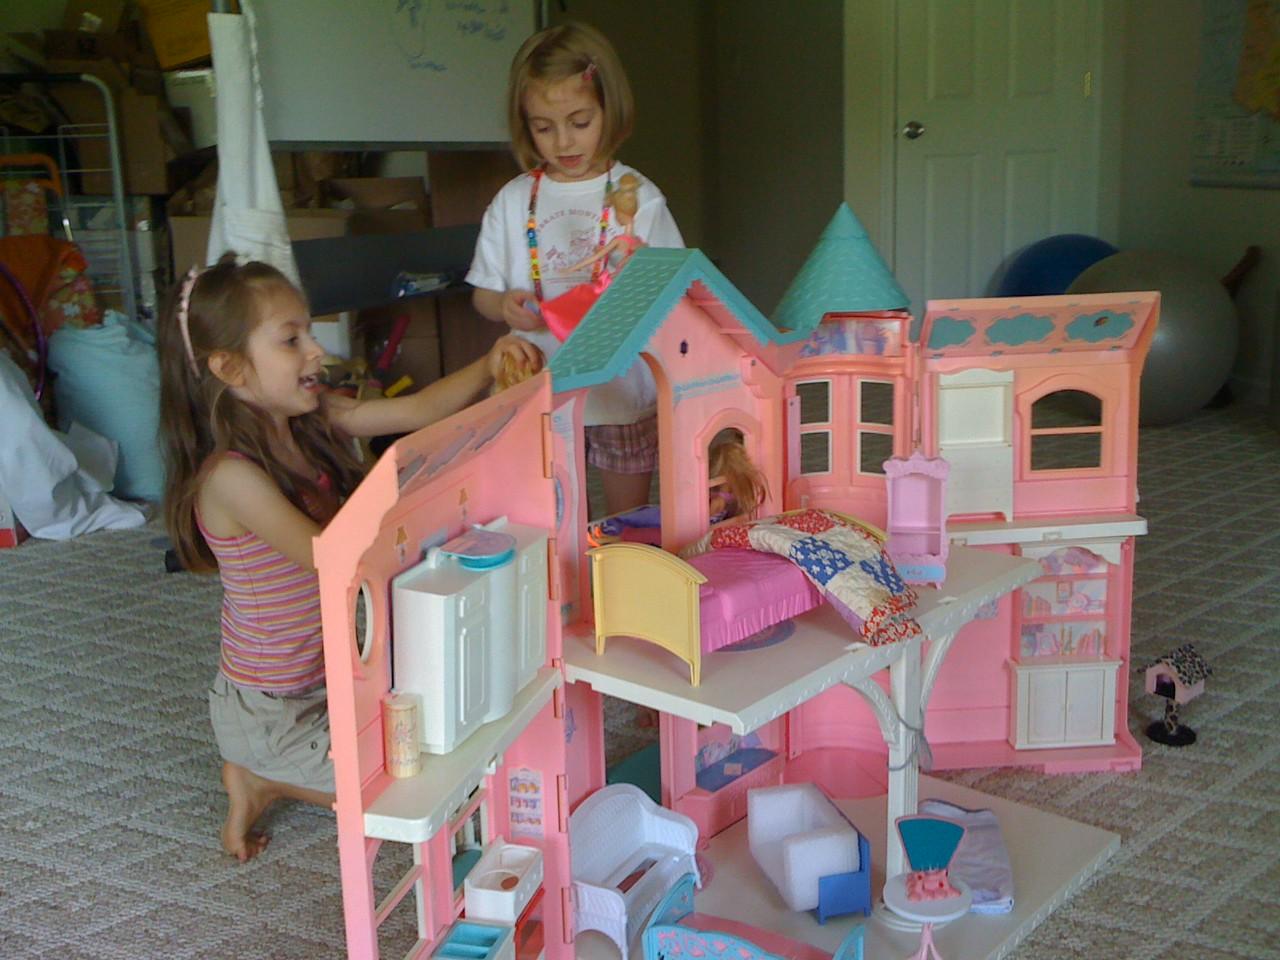 Dorbie mansion